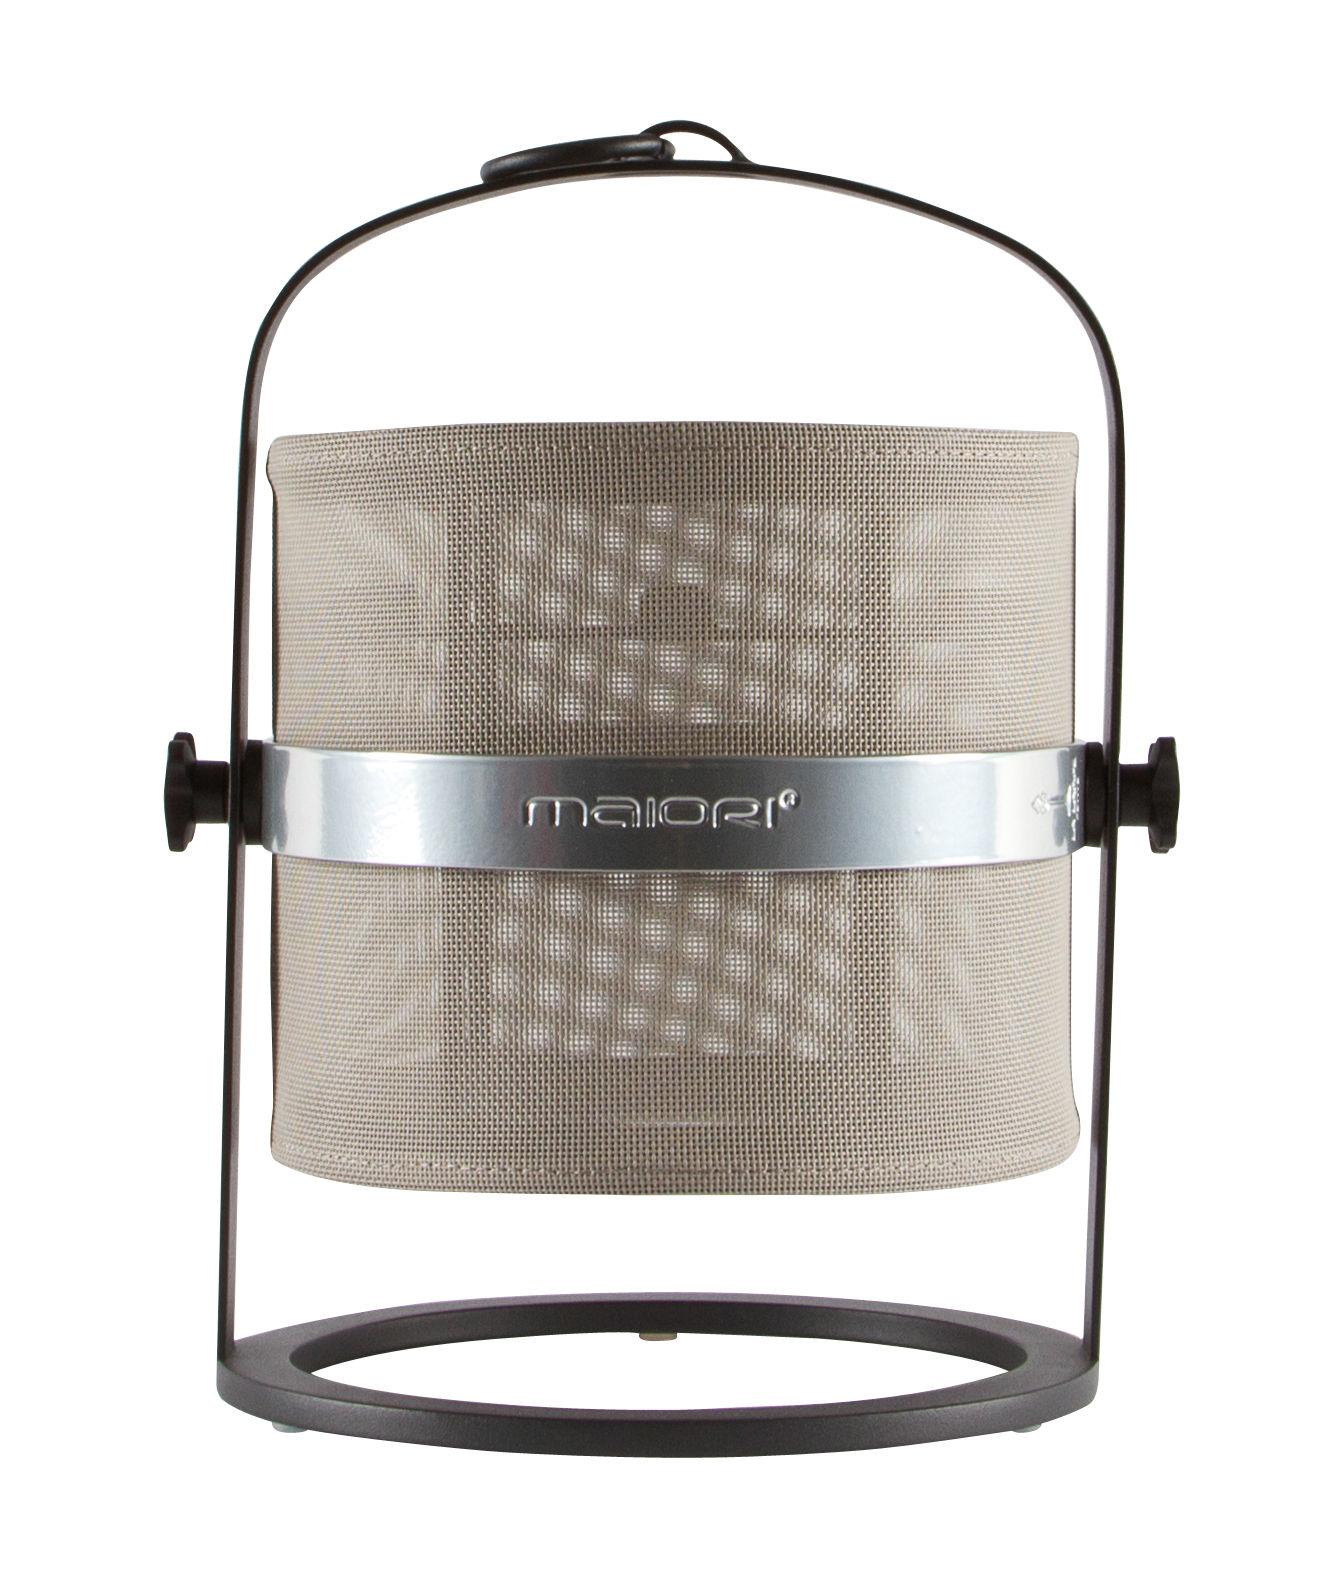 la lampe petite led kabellos gestell schwarz maiori. Black Bedroom Furniture Sets. Home Design Ideas